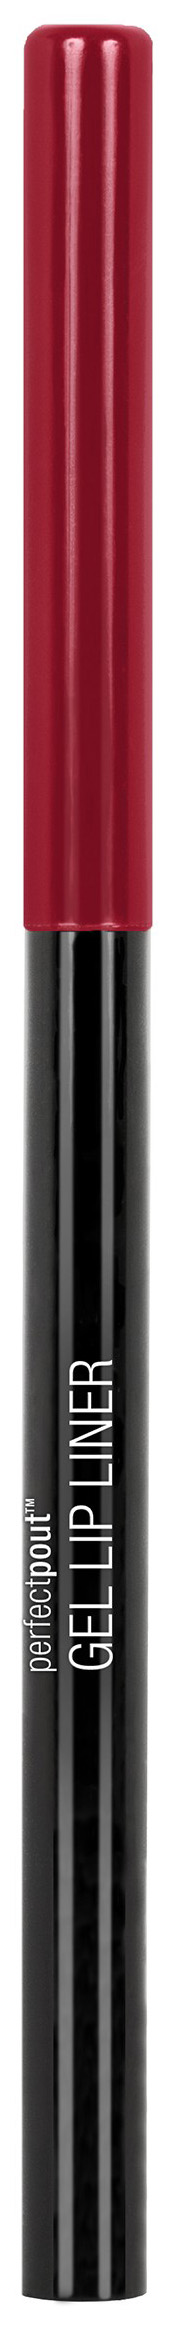 Карандаш для губ Wet n Wild Color Icon Lipliner Pencil E663d